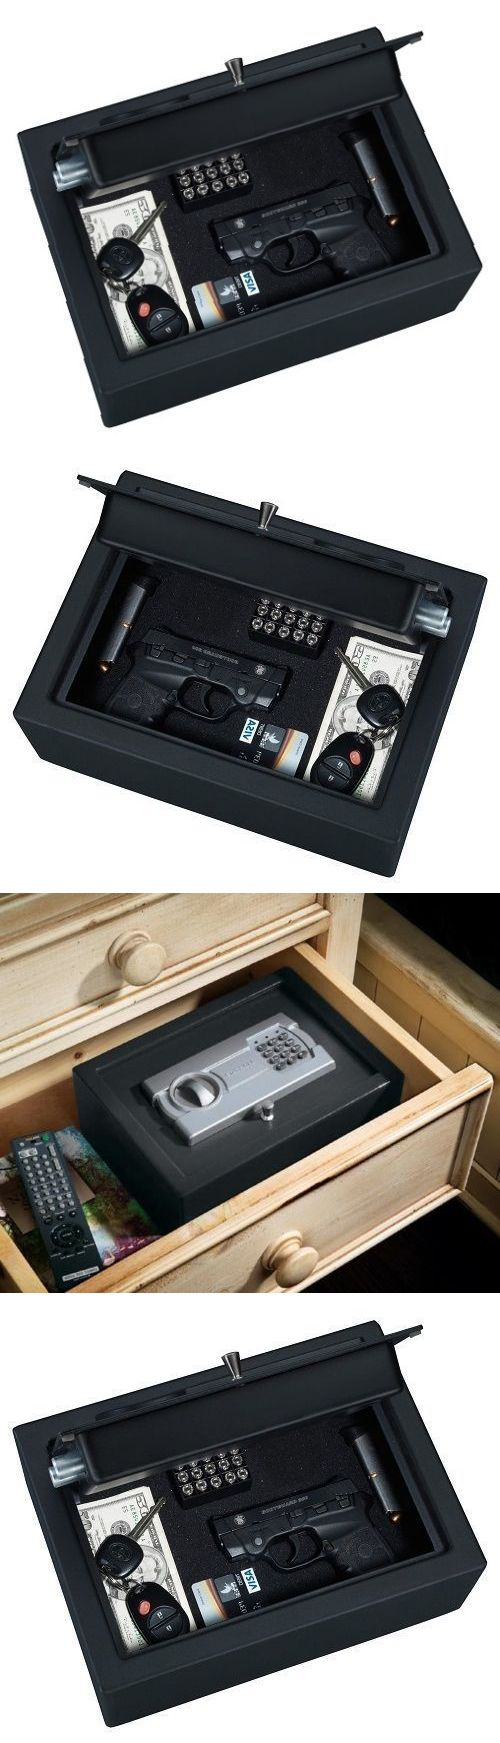 Cabinets and Safes 177877: Hand Gun Safe Pistol Vault Box Lock Handgun Storage Safes Cabinet Home Security BUY IT NOW ONLY: $49.75